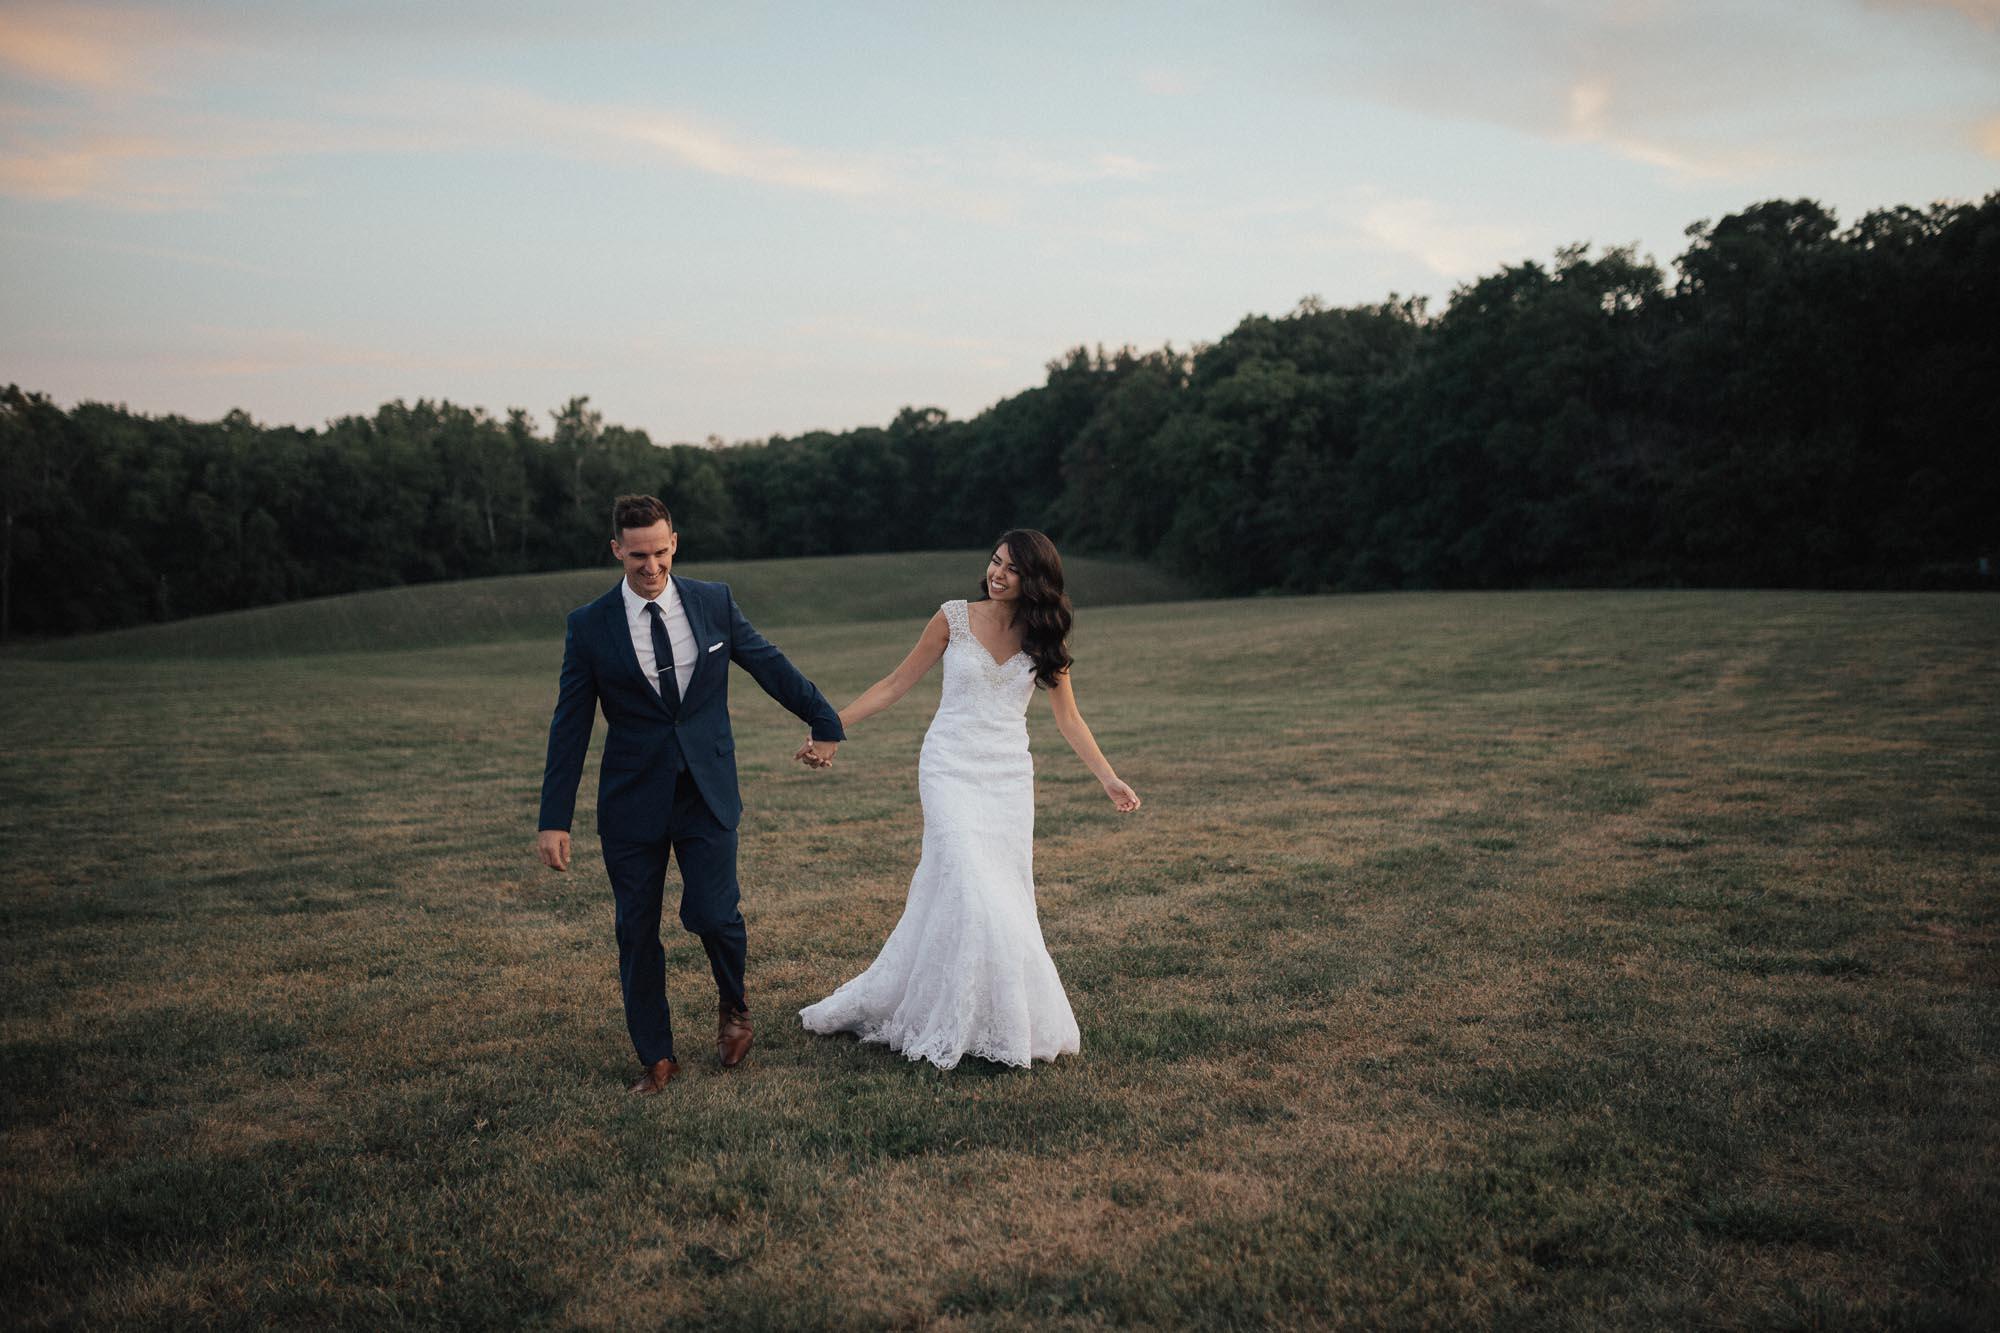 champaign_il_wedding_photography-0919.jpg